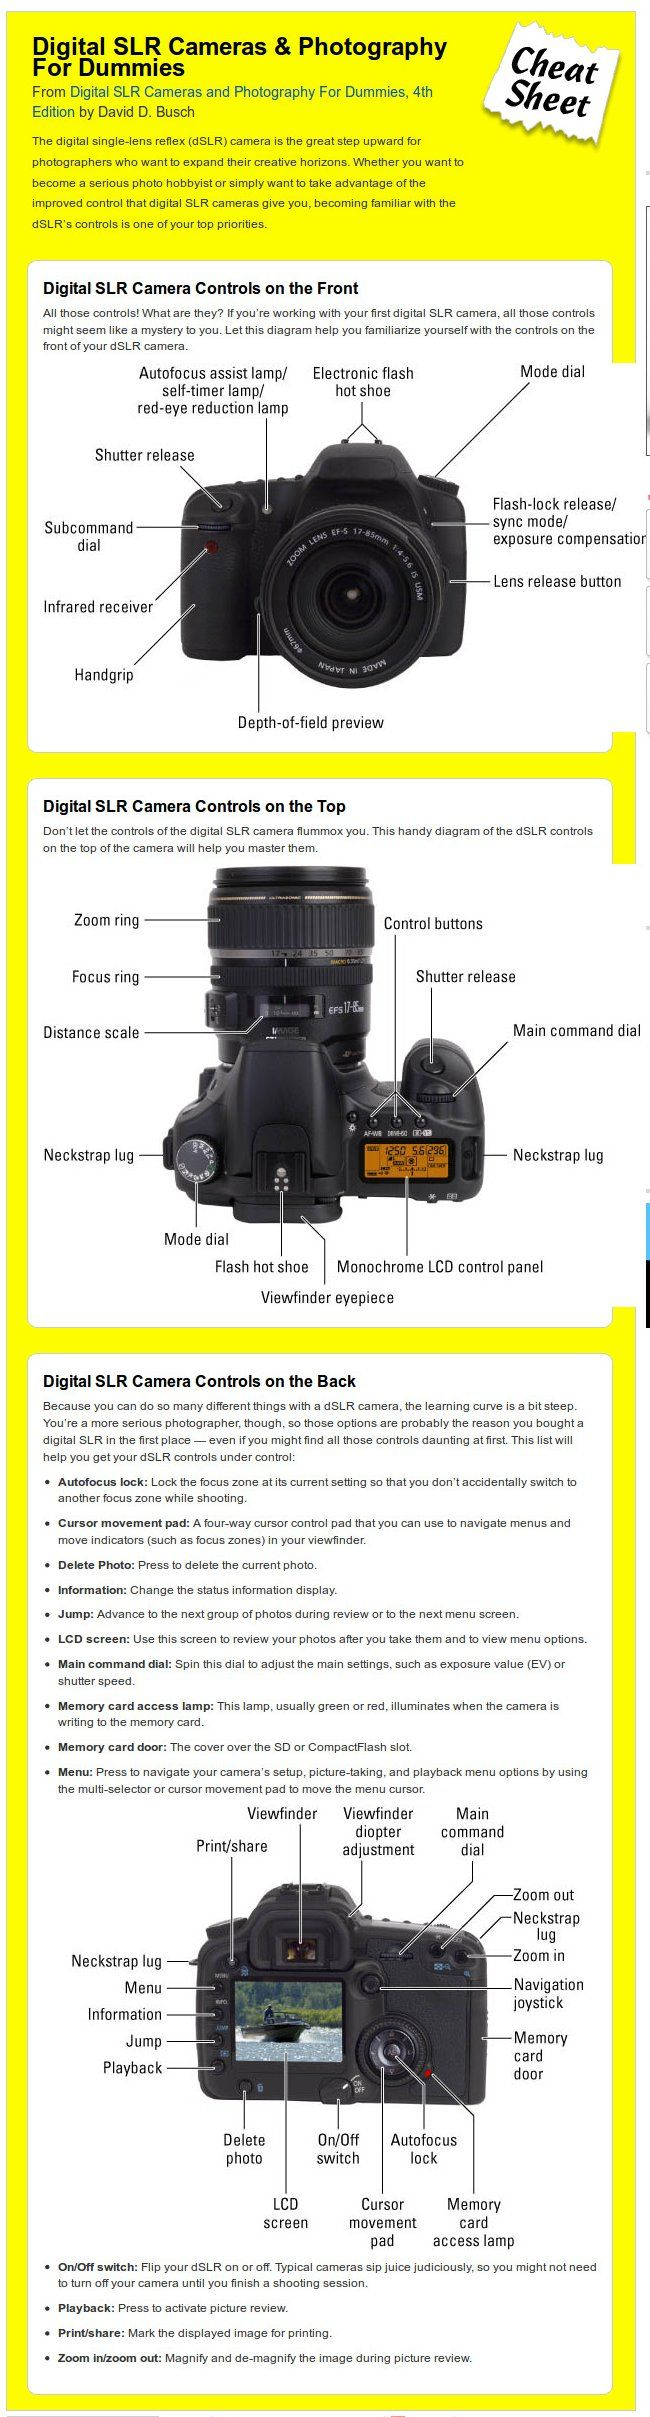 Digital slr cameras and photography for dummies book dvd bundle David Beckham 2018 Pictures, Photos Images - Zimbio